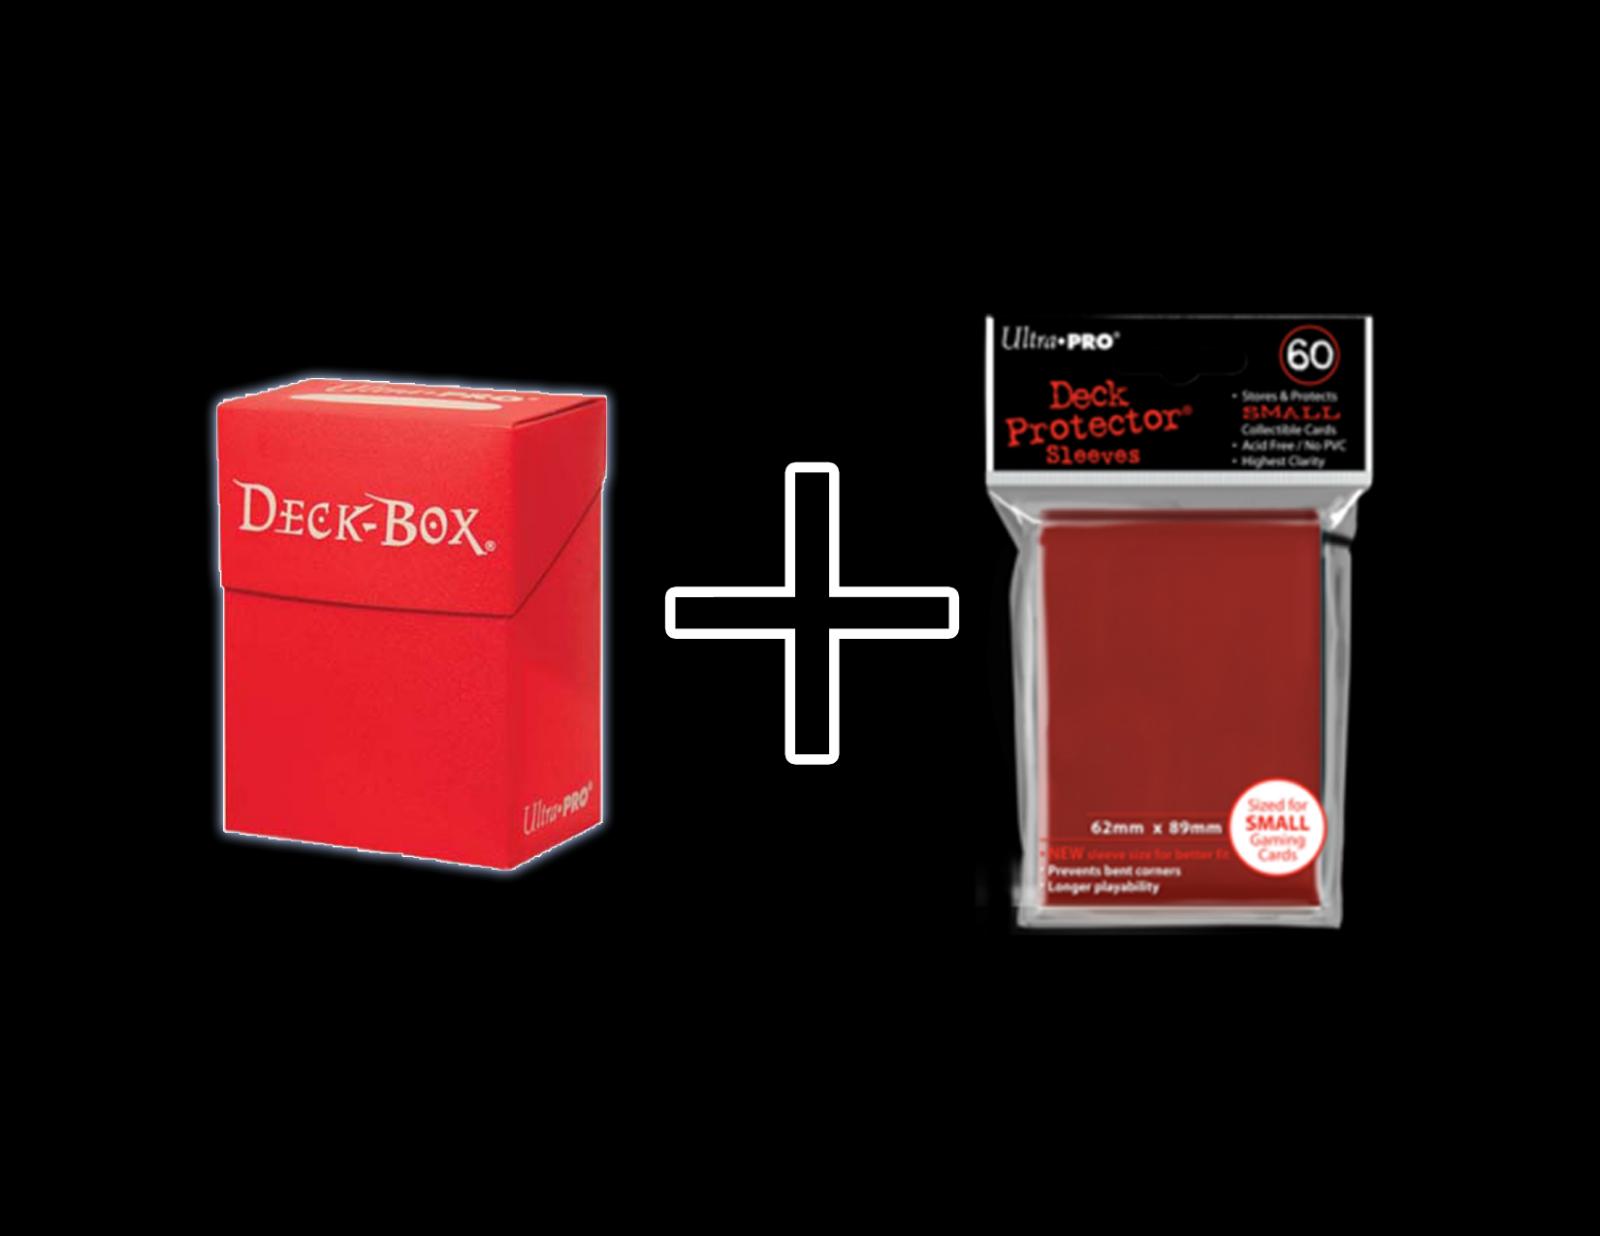 60 Yugioh Card Small Sleeves + Yugioh Deck Box Ultra Pro Bra